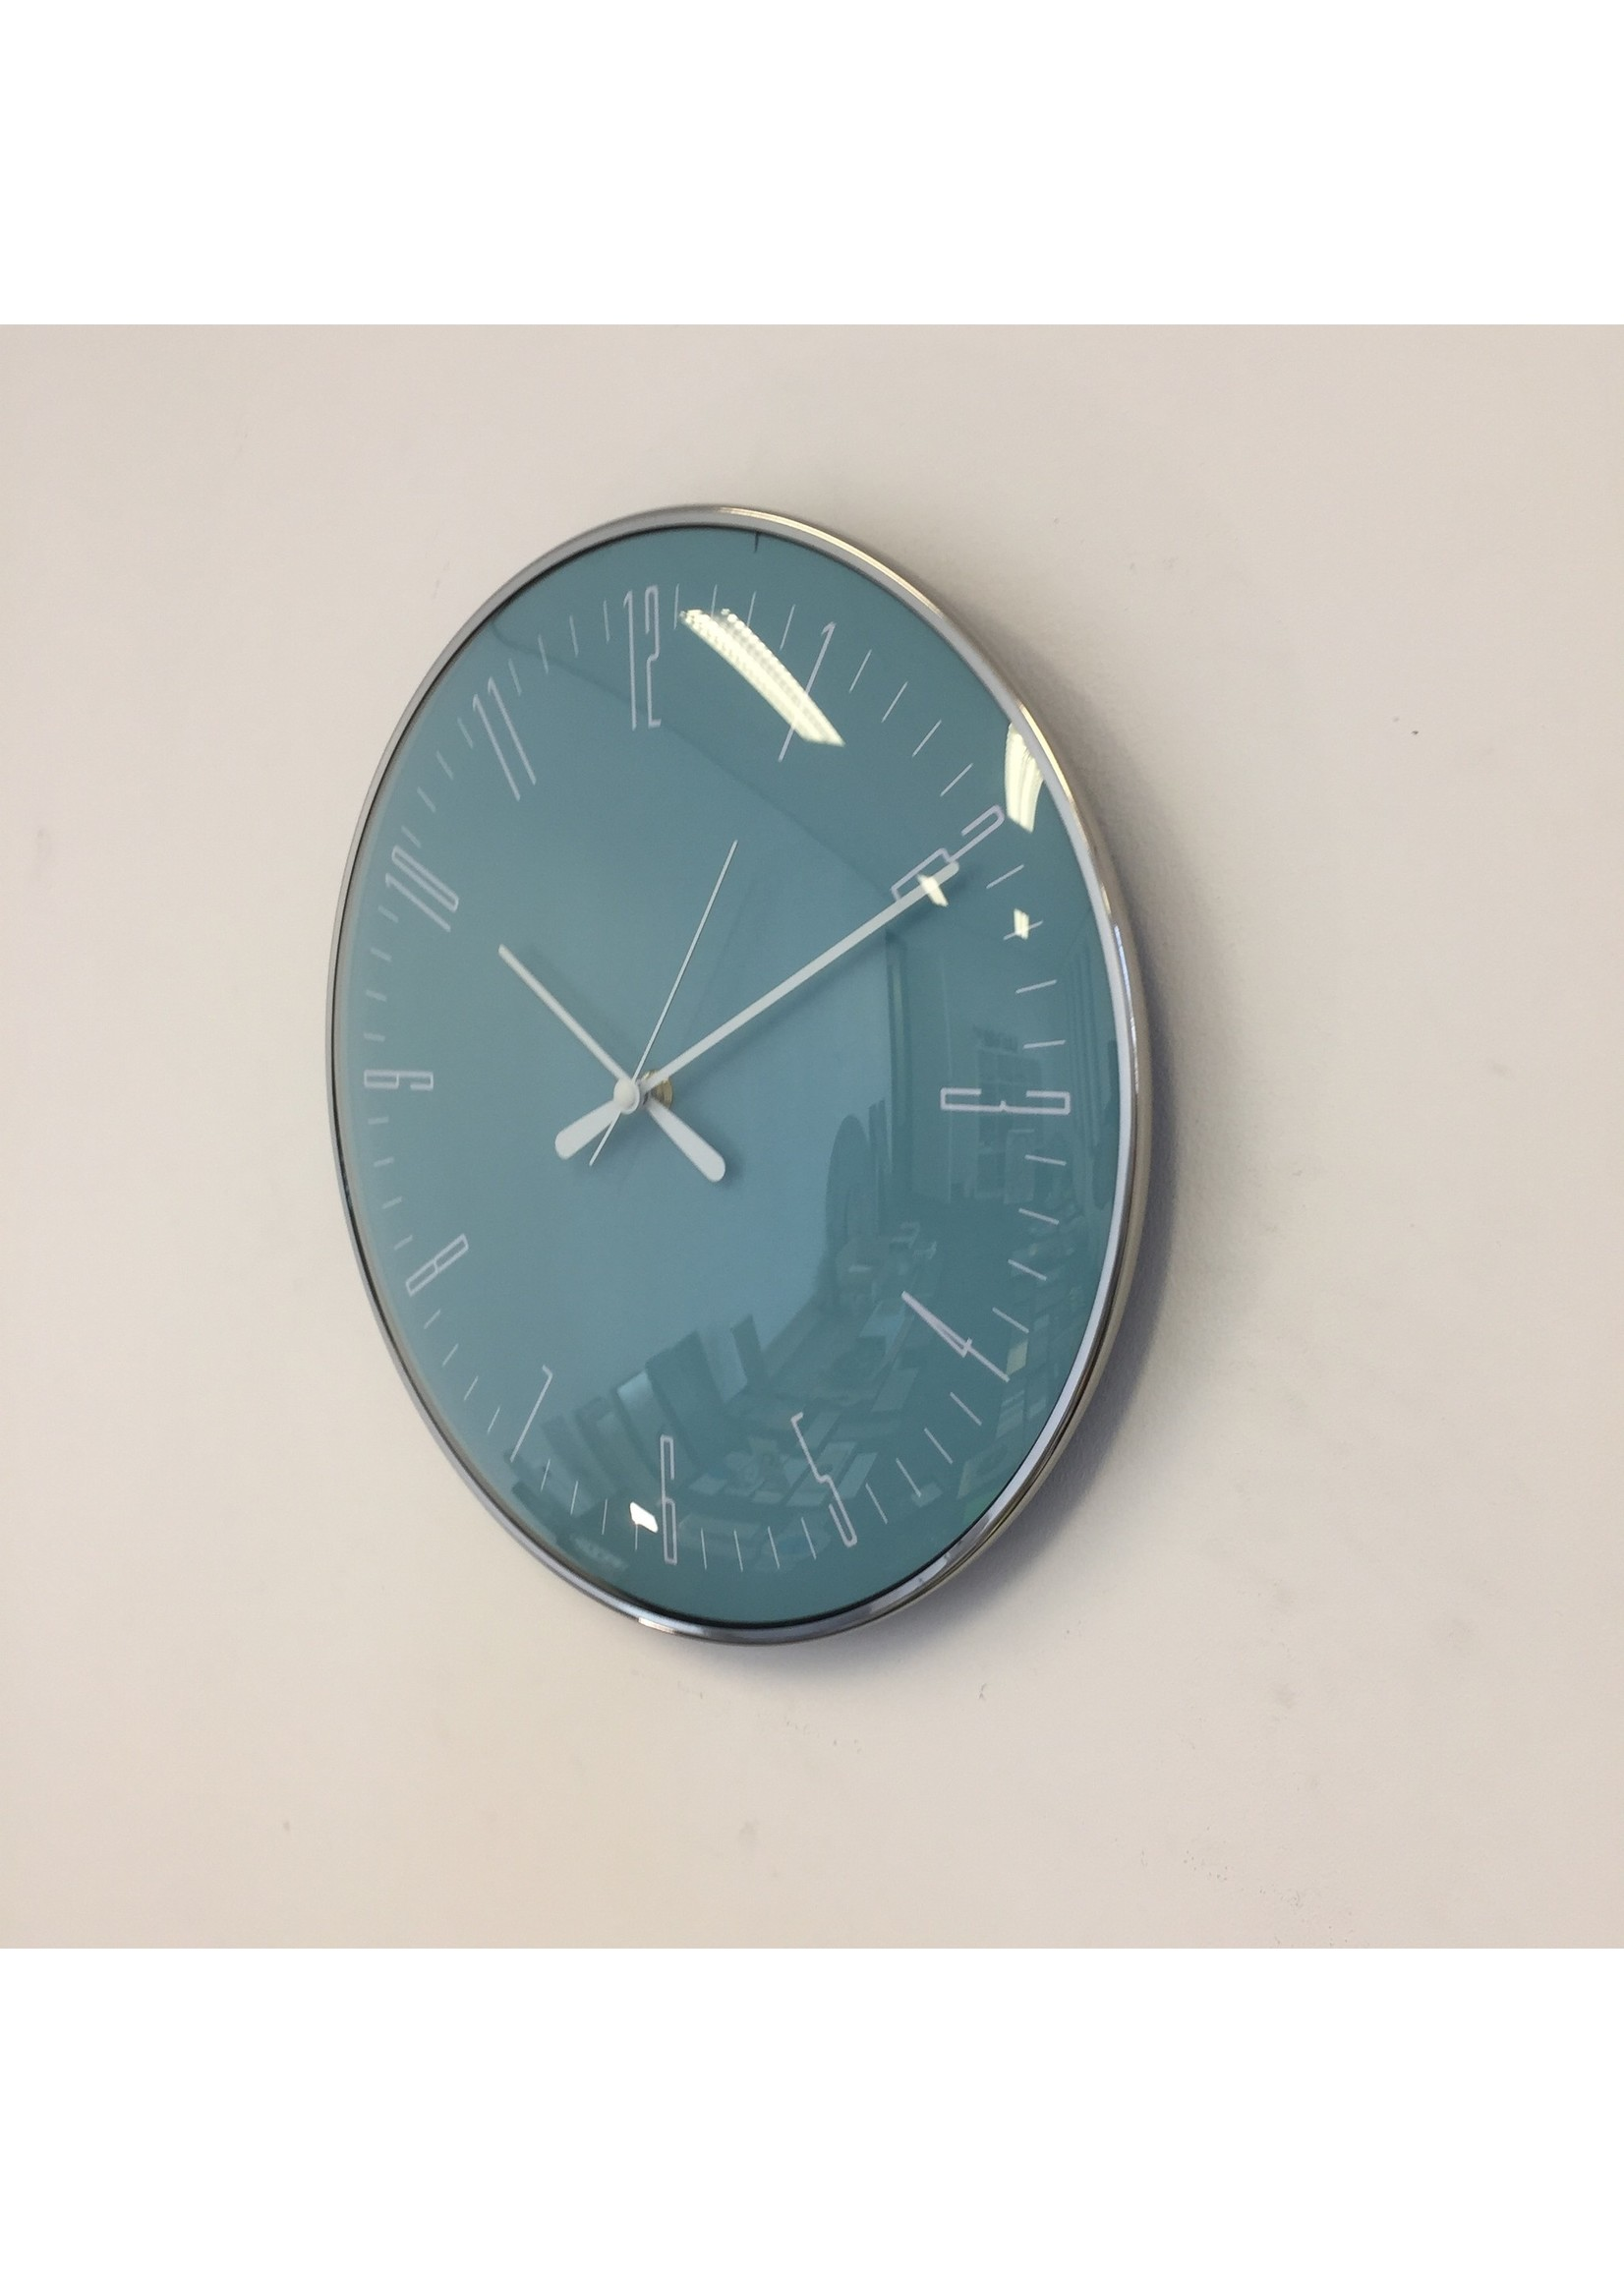 NiceTime Wandklok Blue STYLUS Modern Design